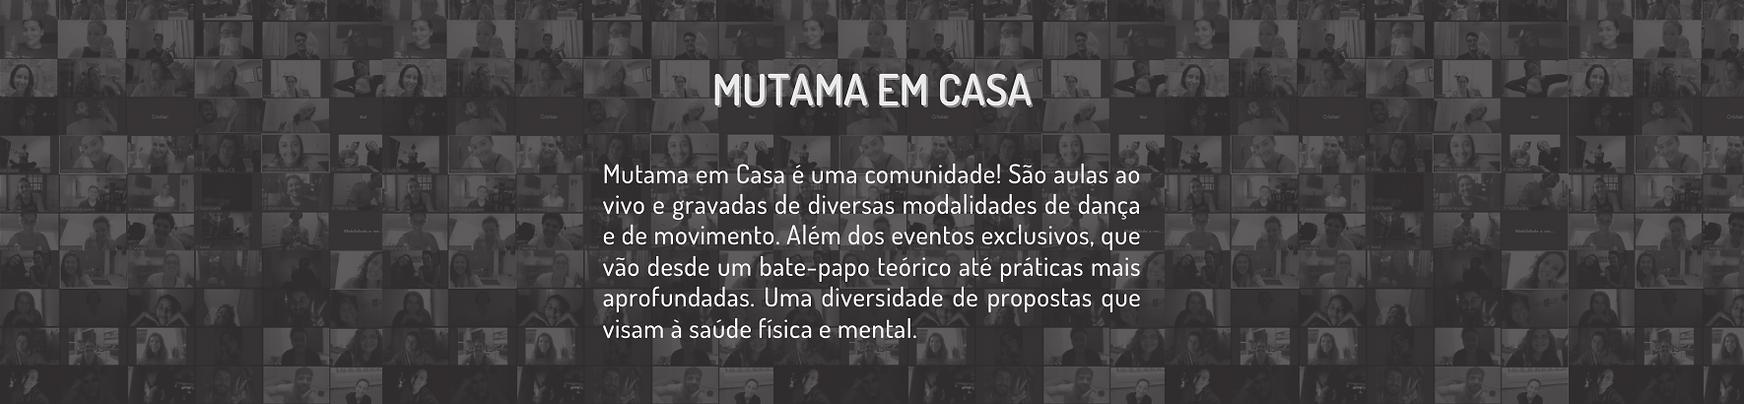 MUTAMA EM CASA (12).png